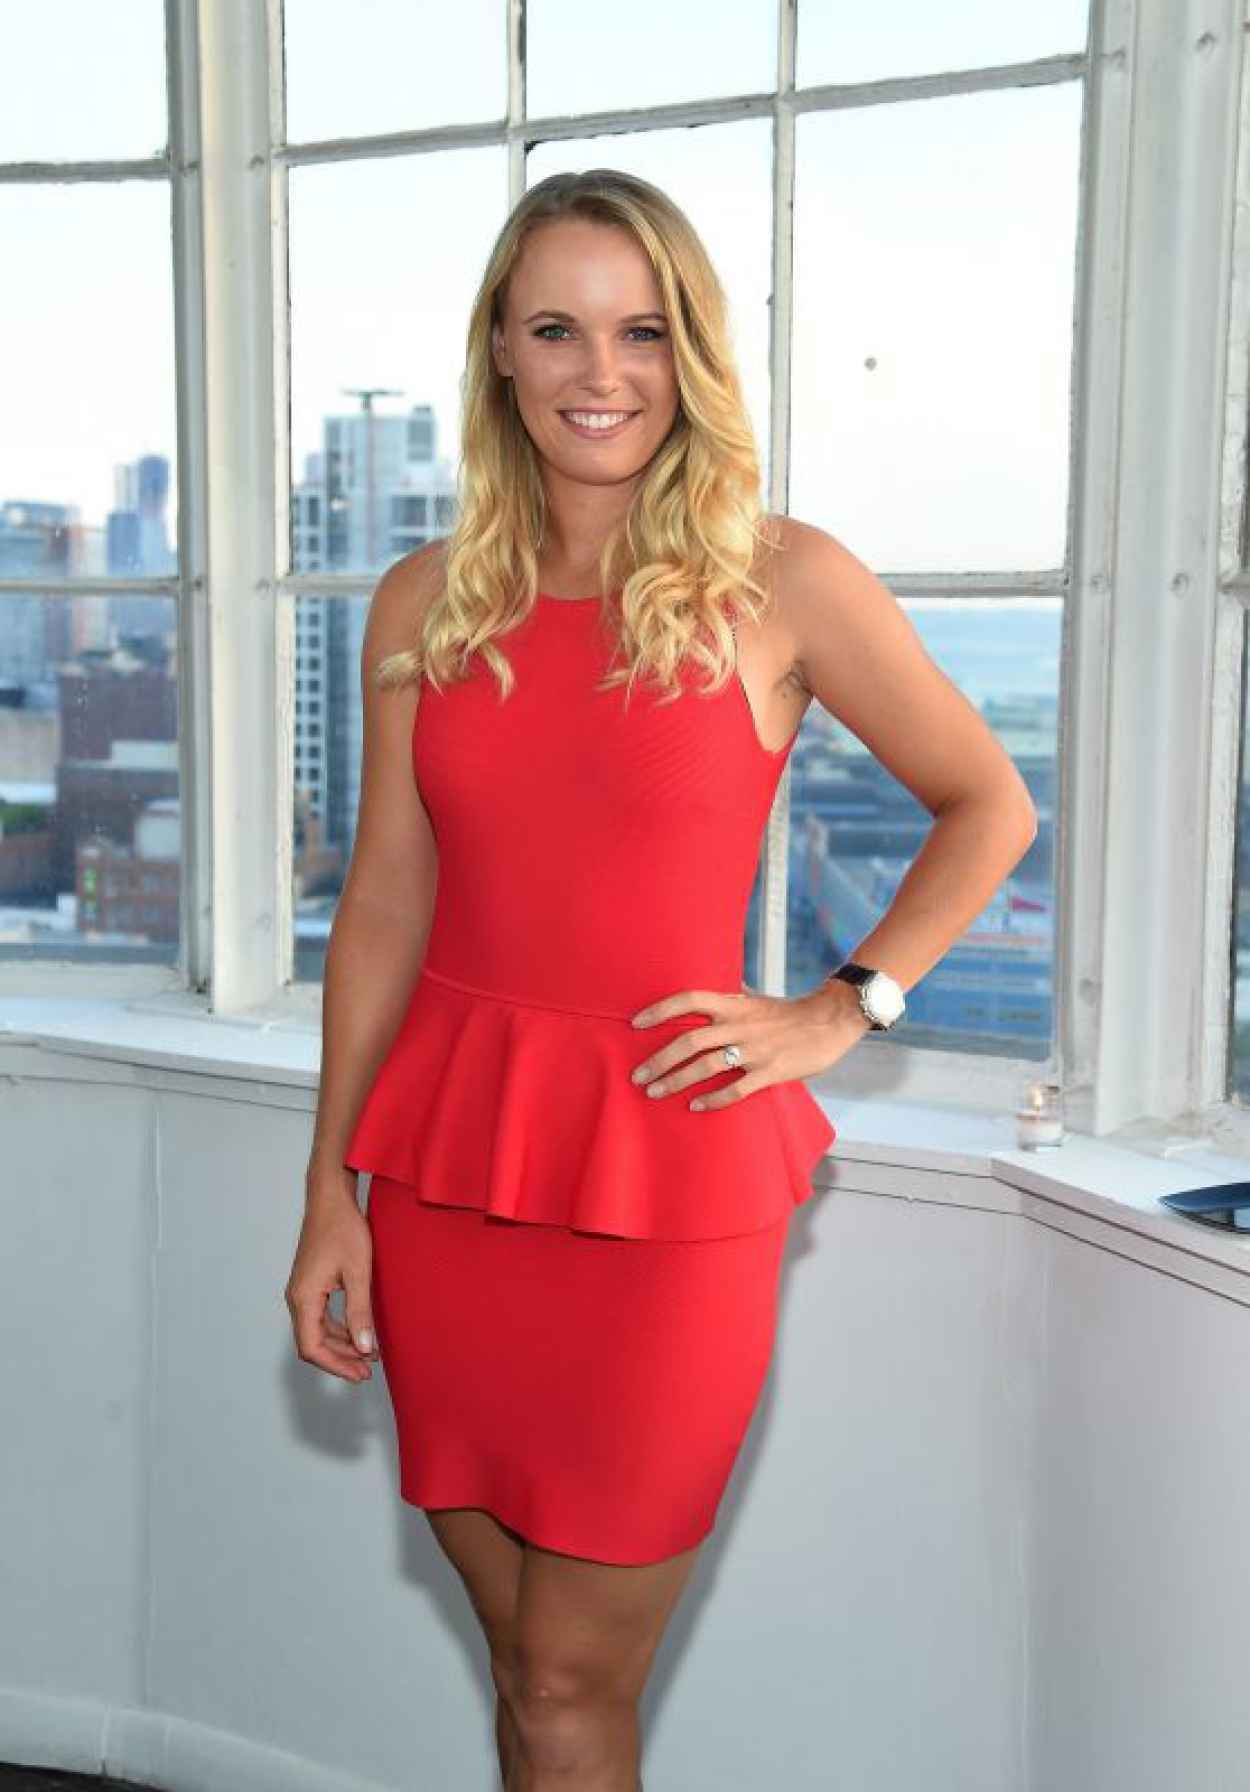 Caroline Wozniacki - Players Tribune Party to celebrate Women in Sports and the 2015 U.S. Open in New York City-1